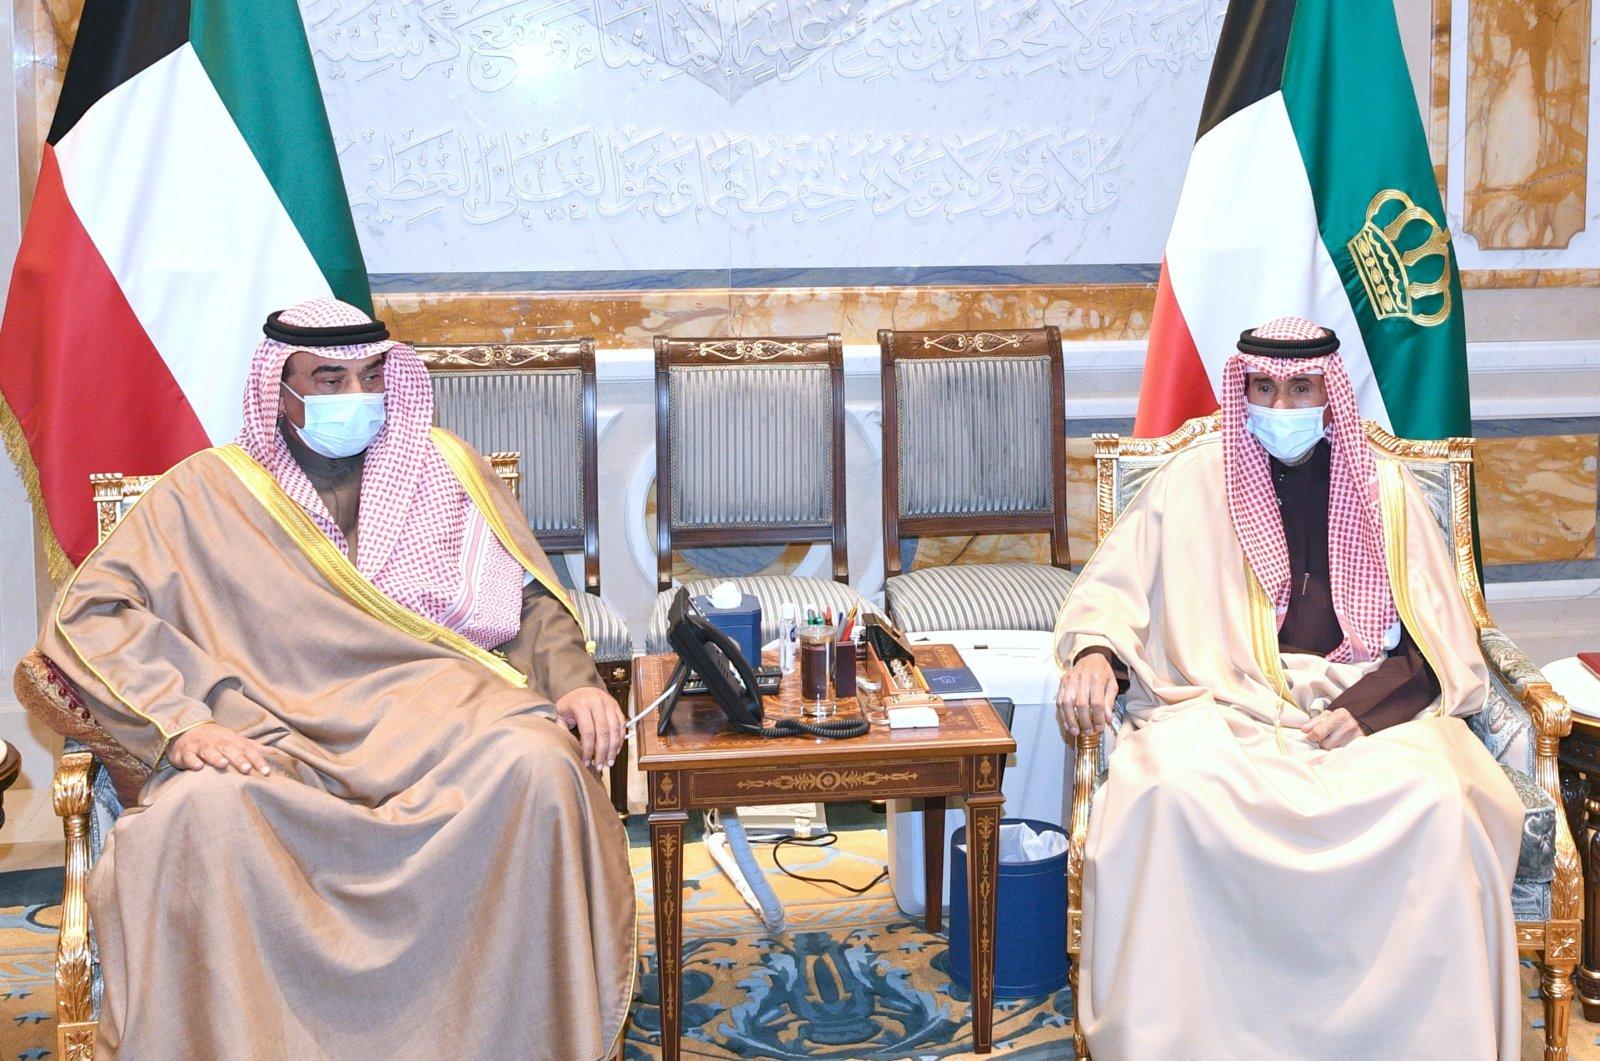 Kuwait's Prime Minister Sabah Al Khalid Al Sabah meets with Emir Sheikh Nawaf Al Ahmed Al Sabah to present the resignation of his Cabinet, in Kuwait City, Kuwait Jan. 13, 2021. (Kuwait News Agency/Al-Diwan Al-Amiri/Handout via Reuters)